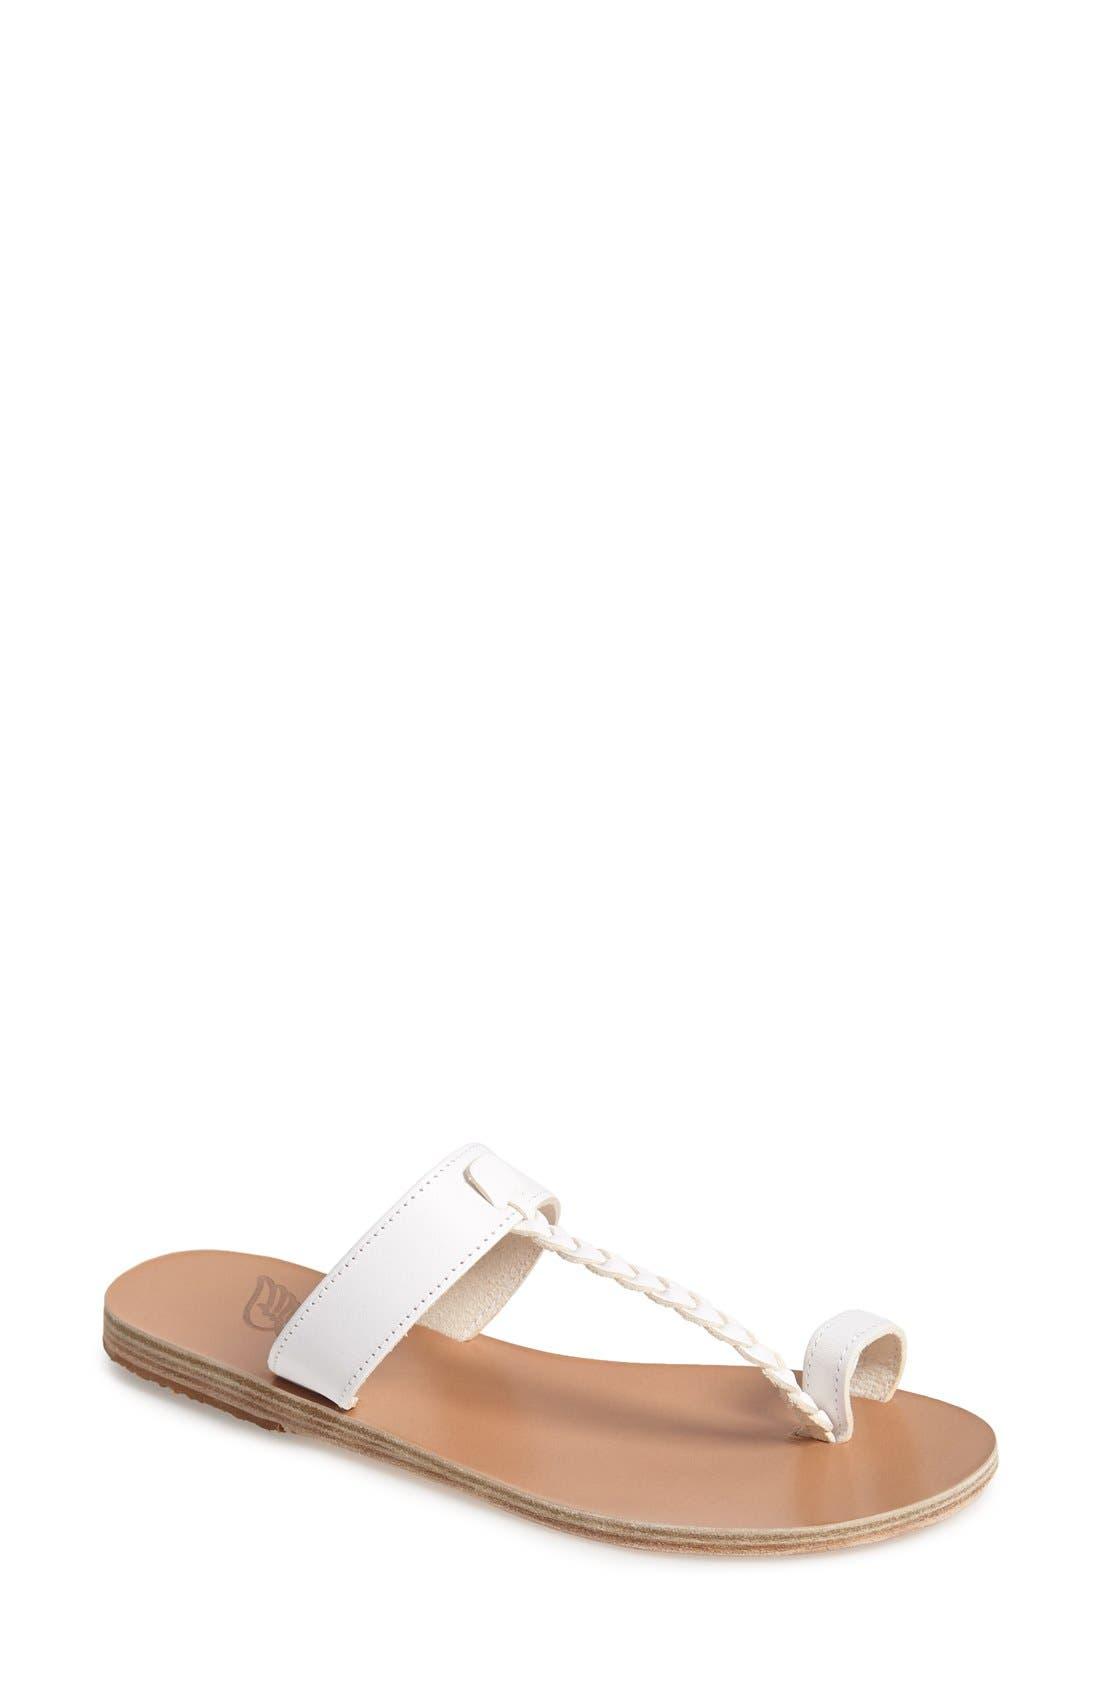 Alternate Image 1 Selected - Ancient Greek Sandals 'Melpomeni' Leather Sandal (Women)